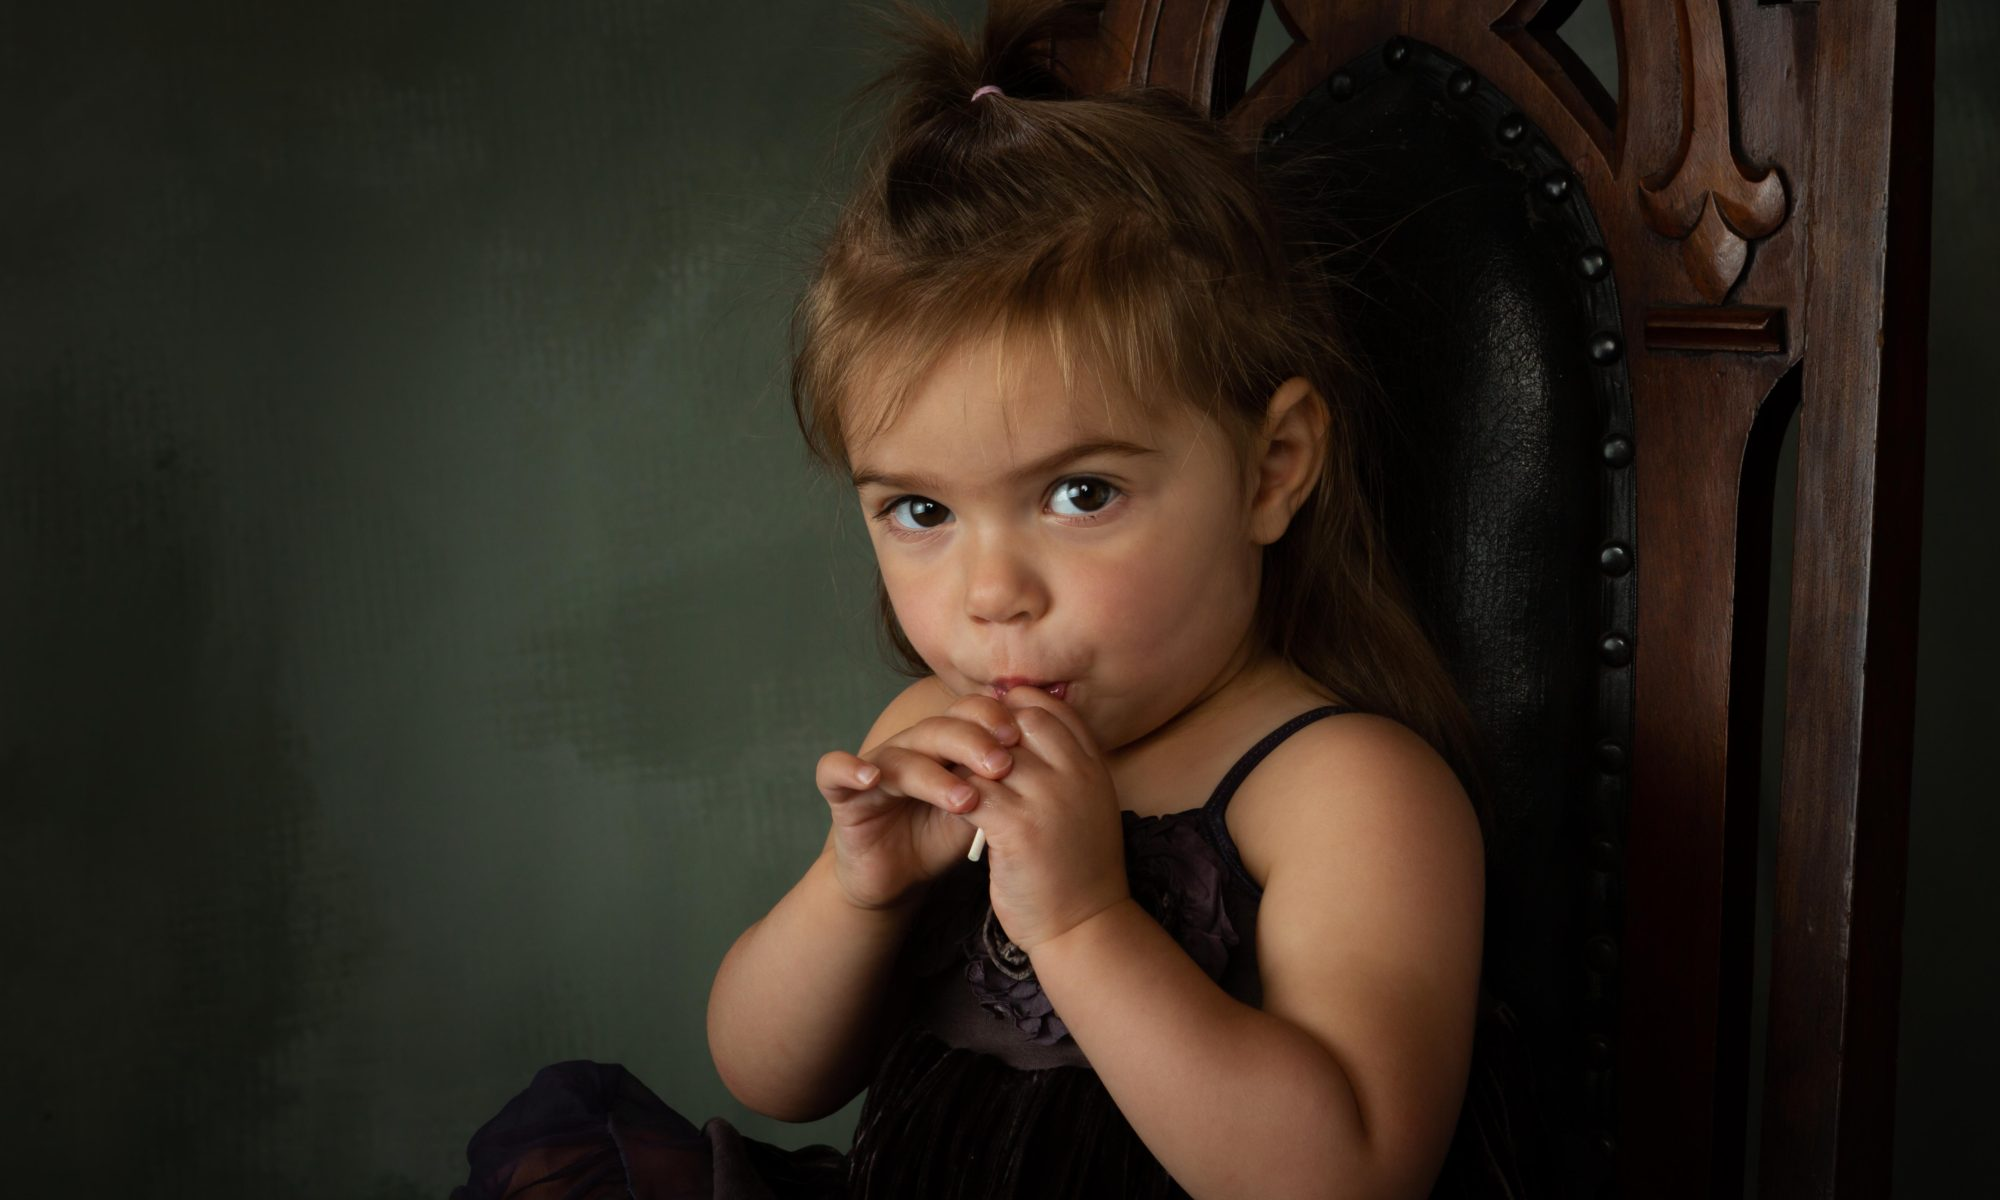 new plan, serious toddler girl, Fort Mill, SC, Tega Cay, sc, Charlotte. NC